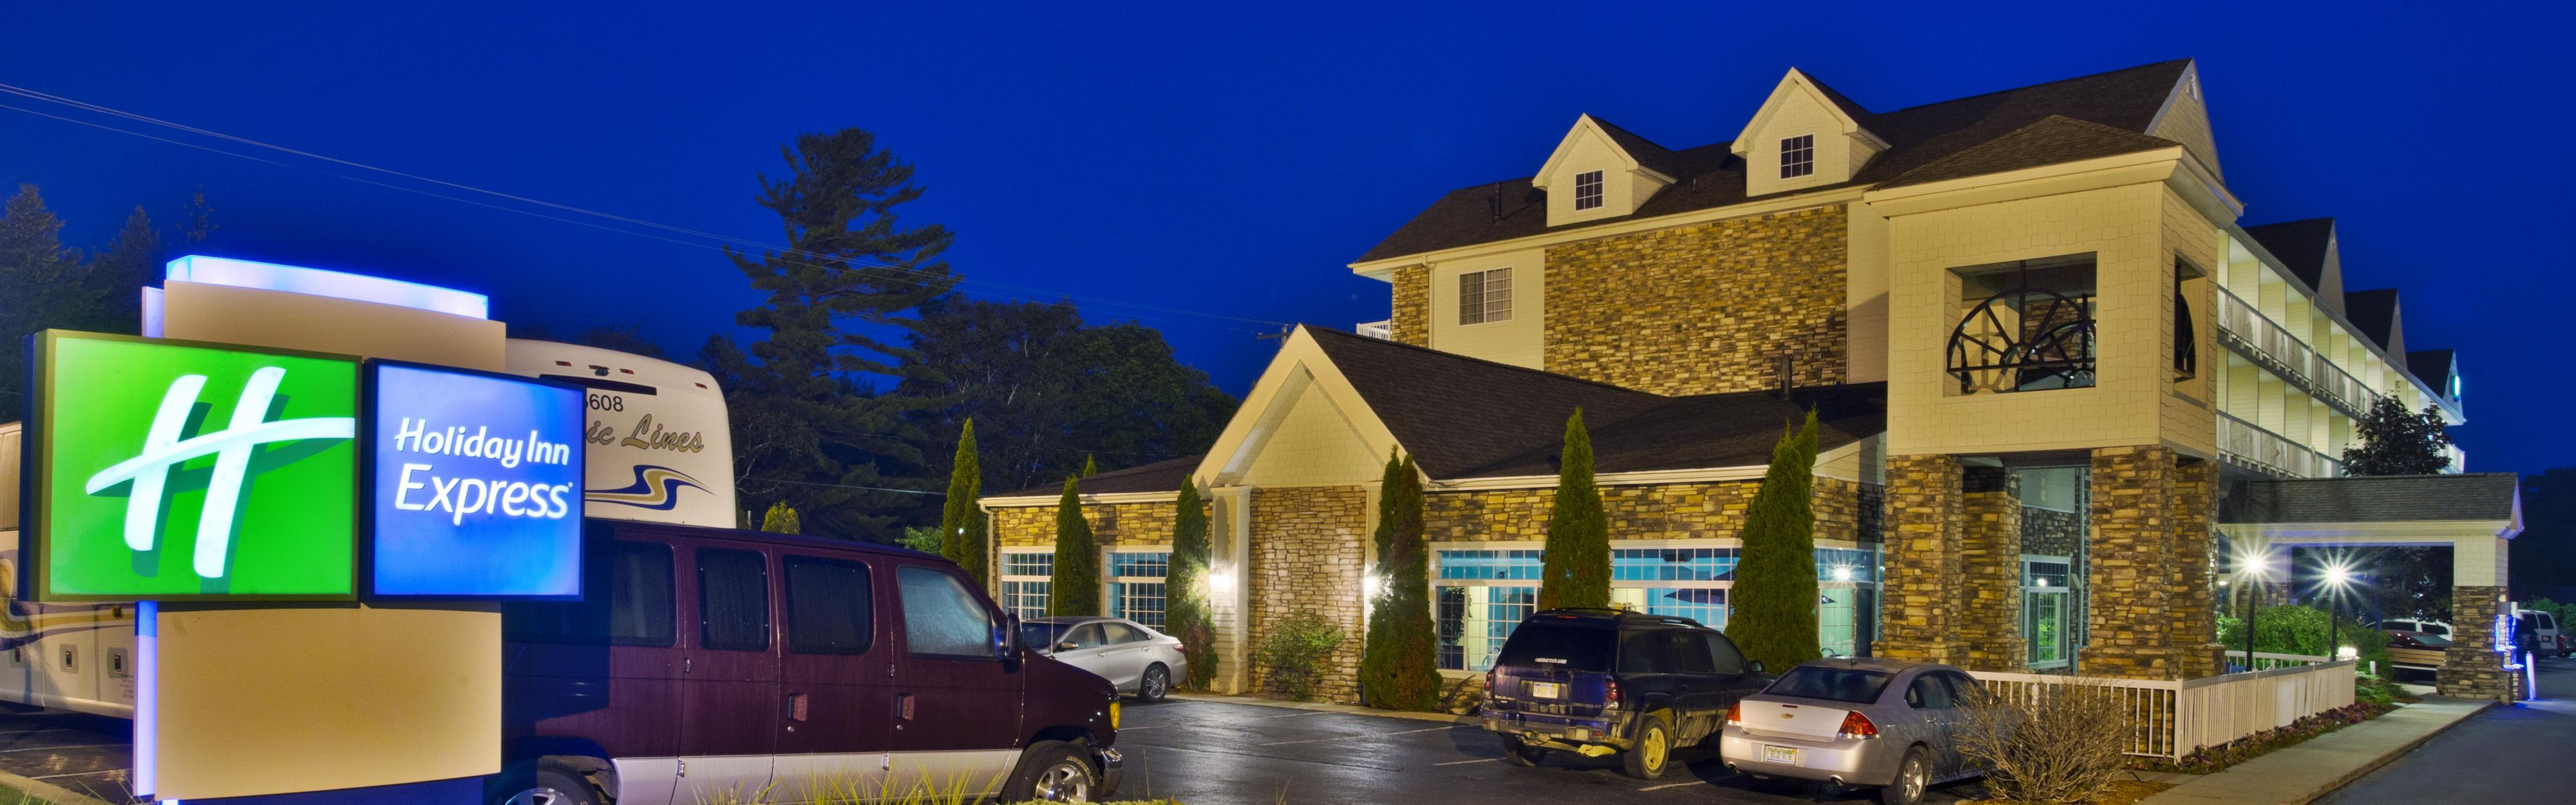 Holiday Inn Express Mackinaw City image 0